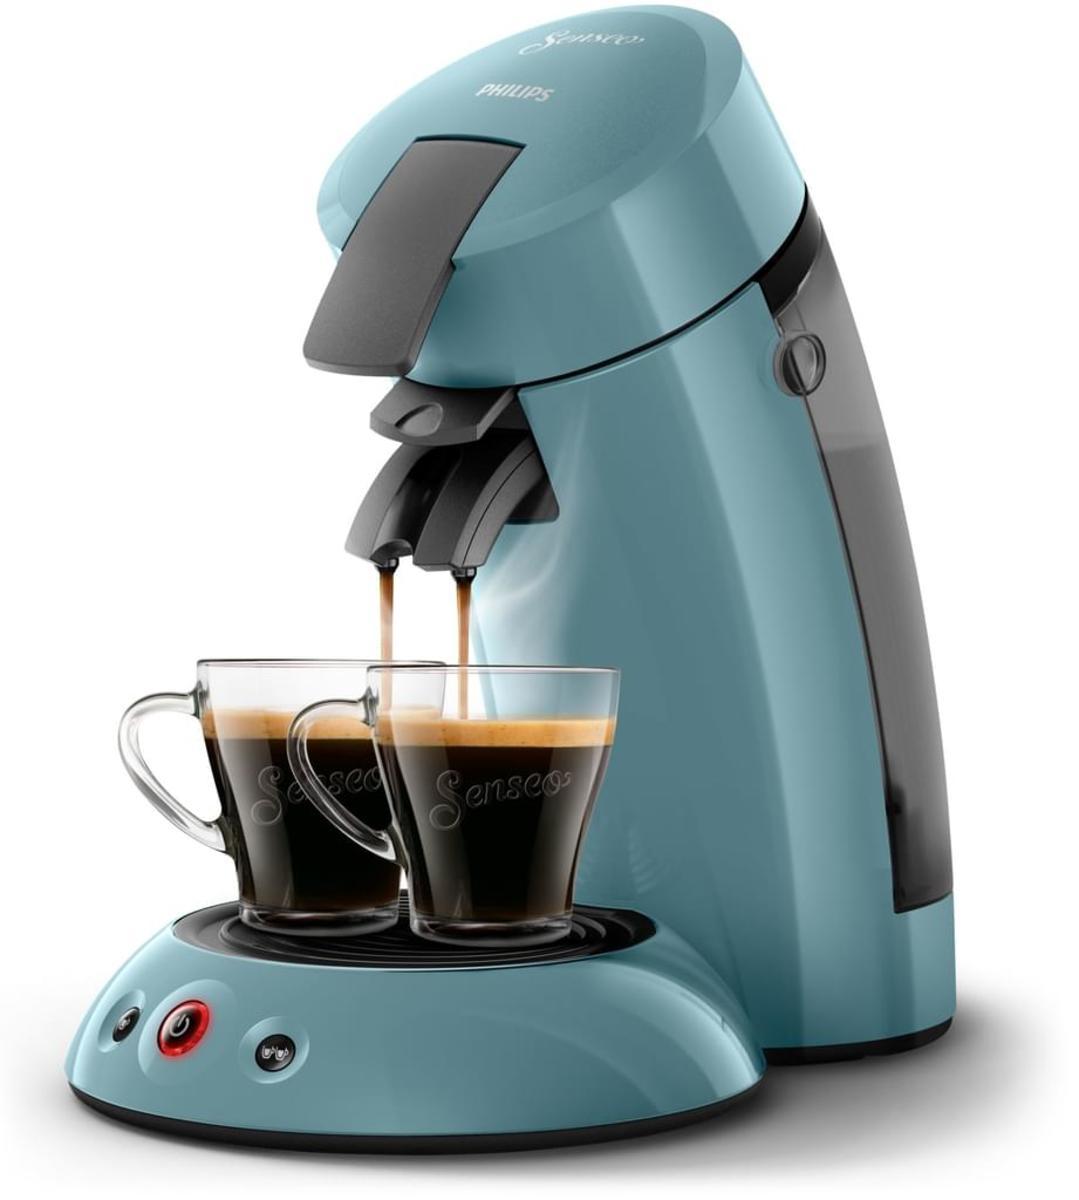 Bild 3 von Philips Senseo Kaffeepadmaschine HD 6553/XX Original, Farbe Petrol